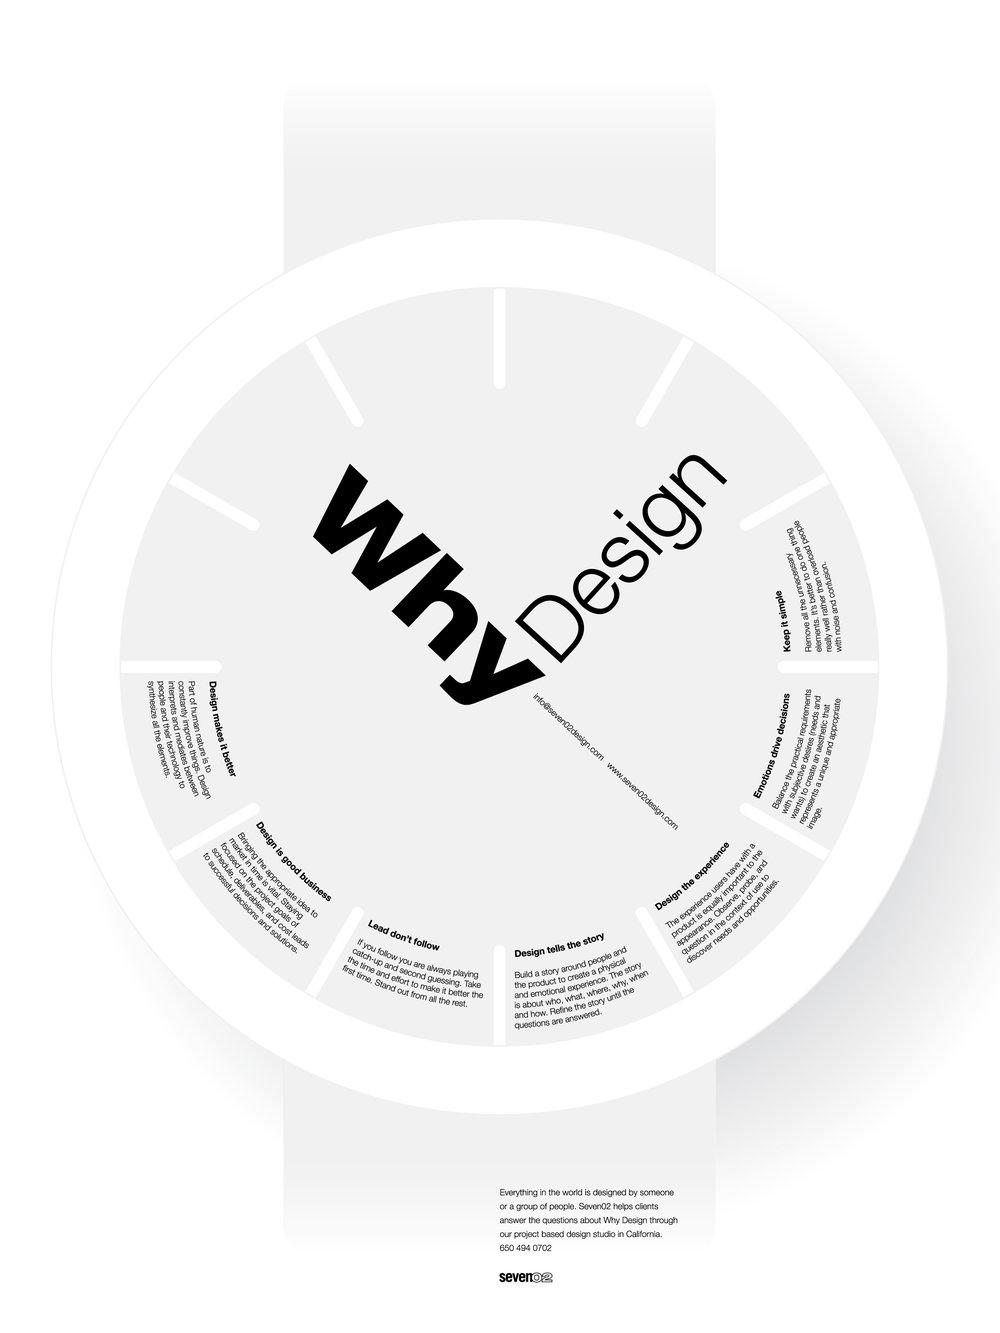 Why-Design-Poster-©2017-seven02-design.jpg